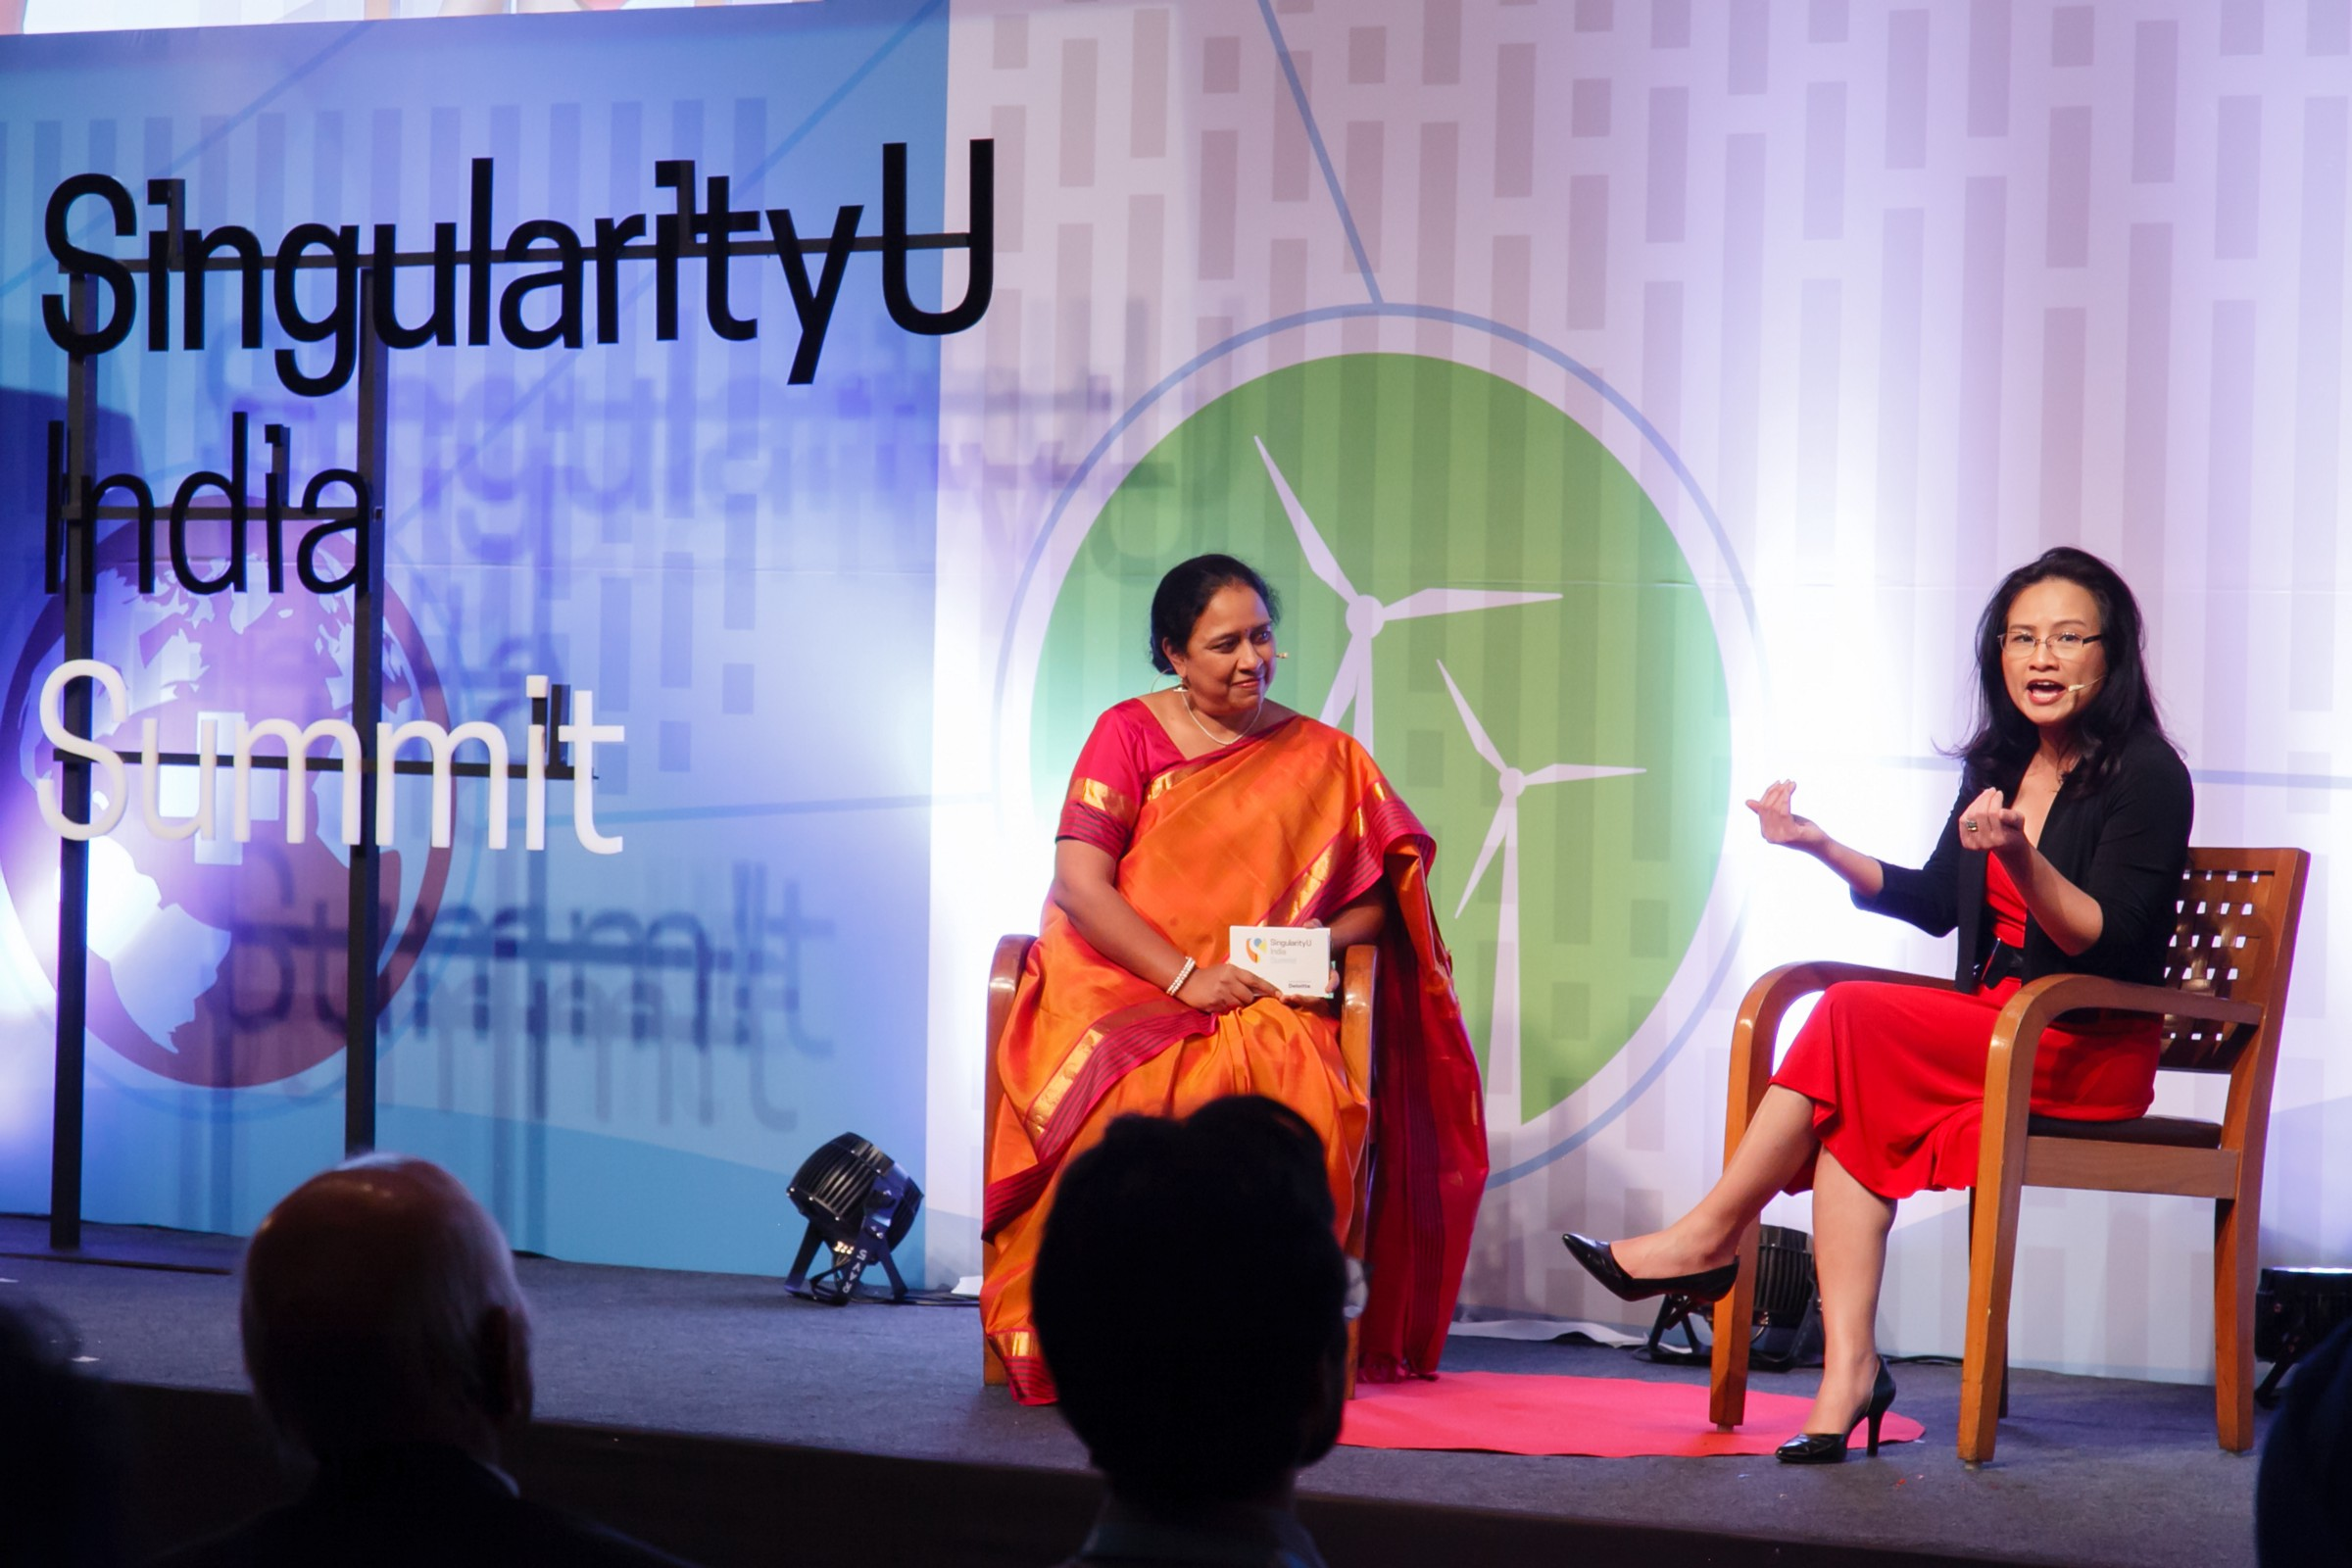 Emeline Paat-Dahlstrom speaks at SingularityU Summit in India